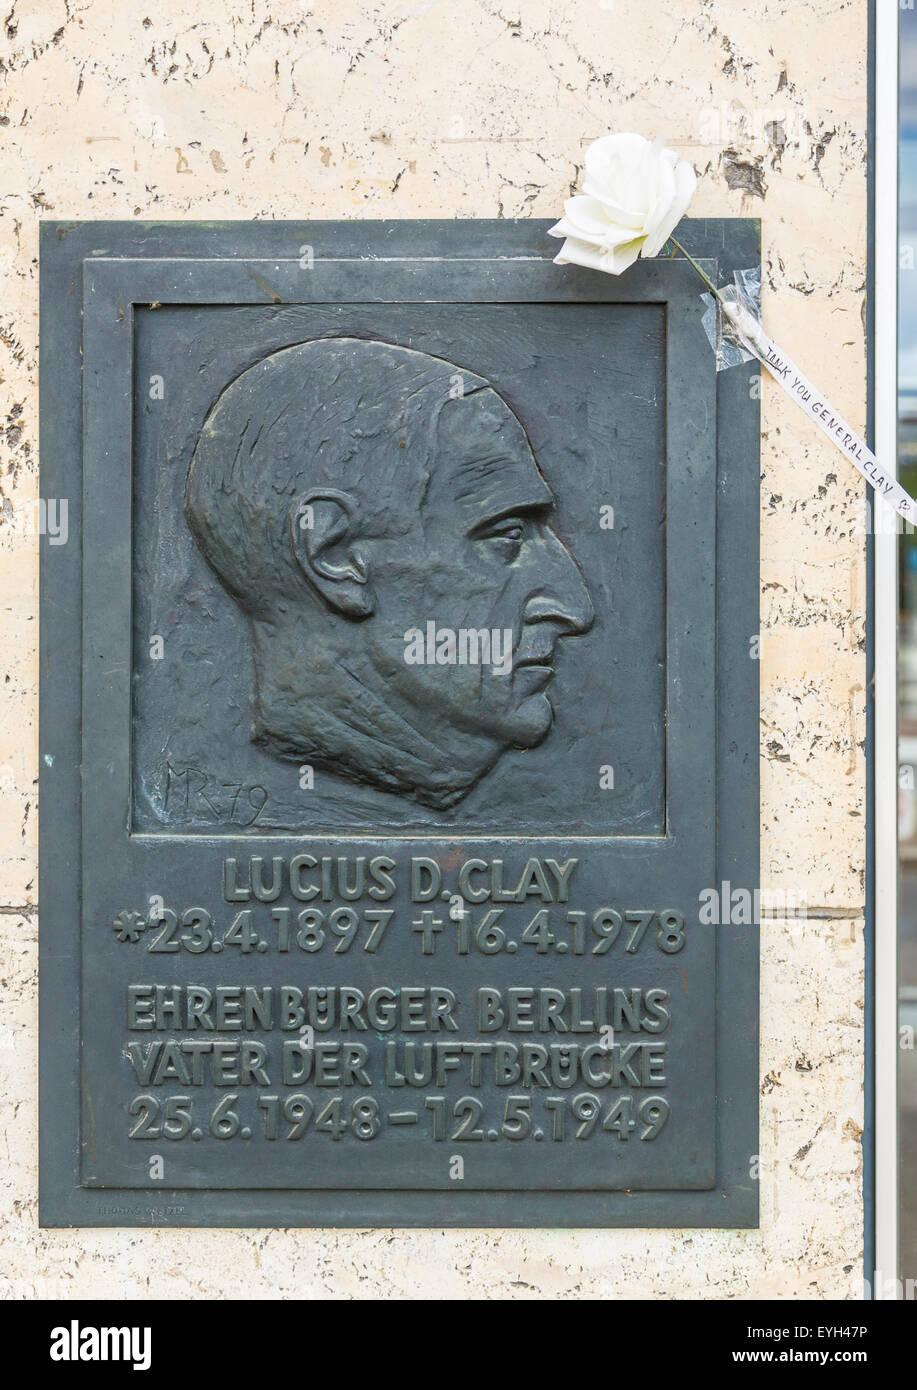 Memorial stone of Lucius D. Clay at Tempelhof airport, Berlin, Germany. - Stock Image